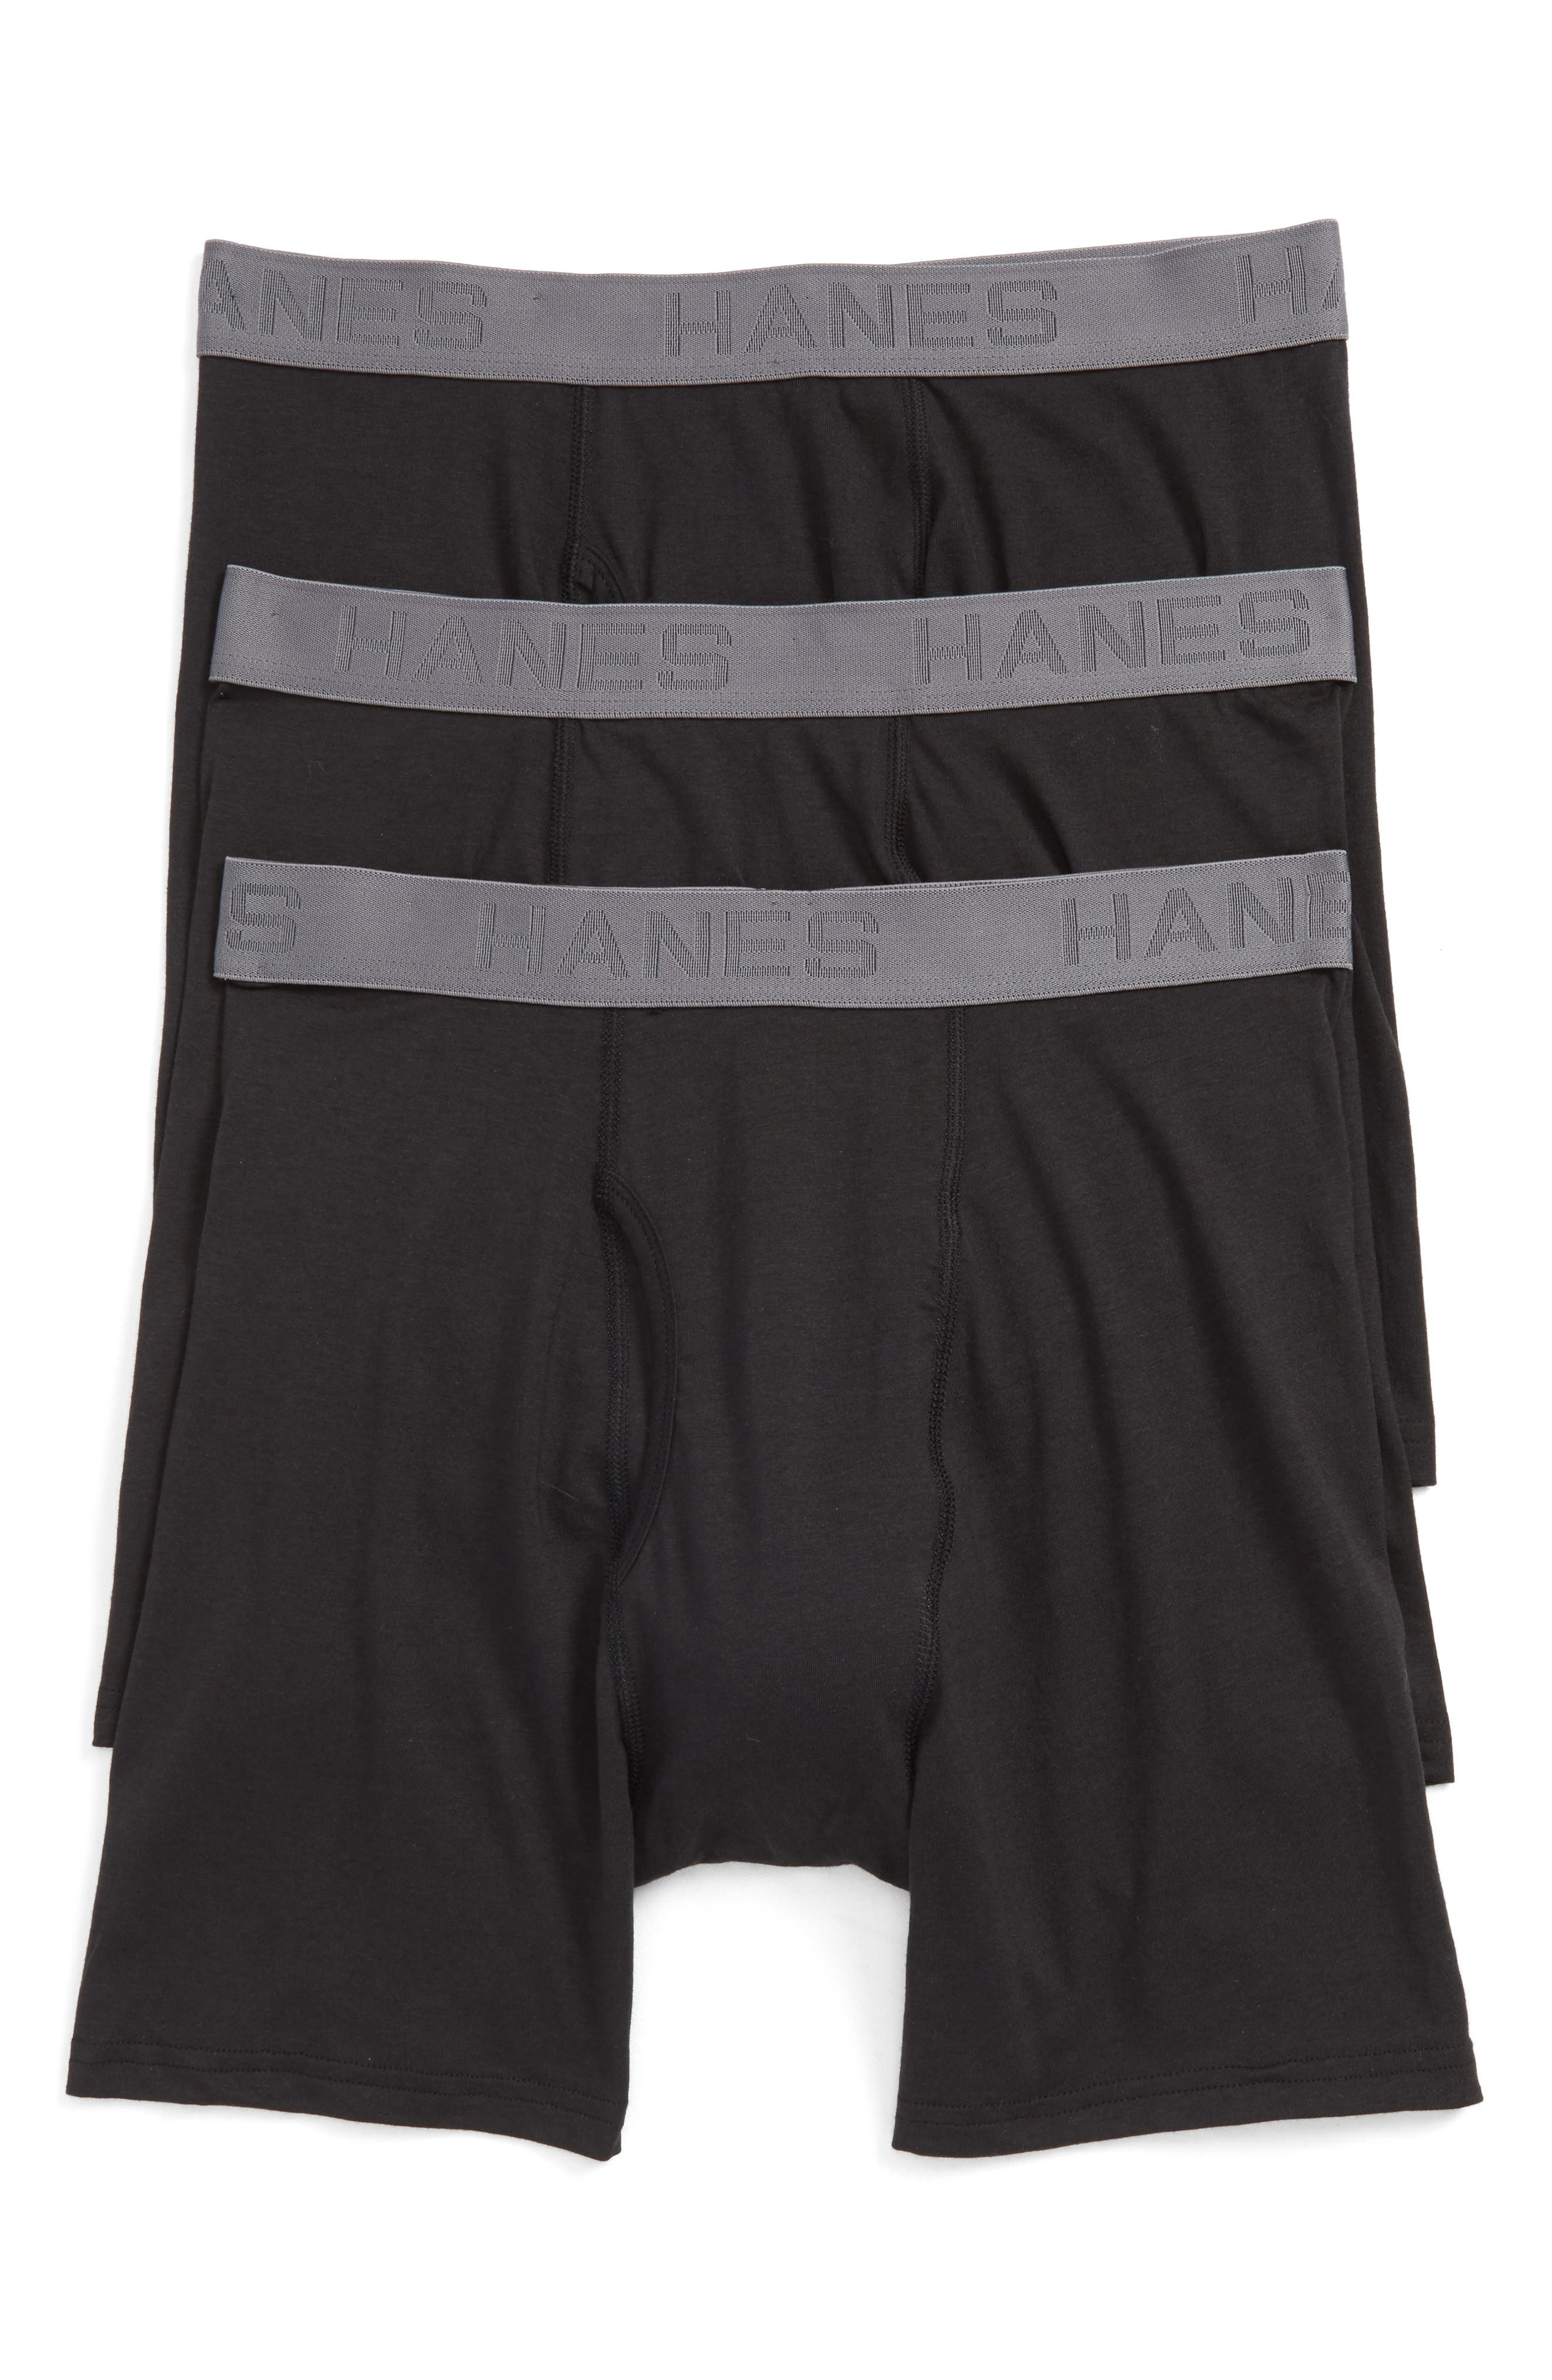 Alternate Image 1 Selected - Hanes Luxury Essentials 3-Pack Boxer Briefs